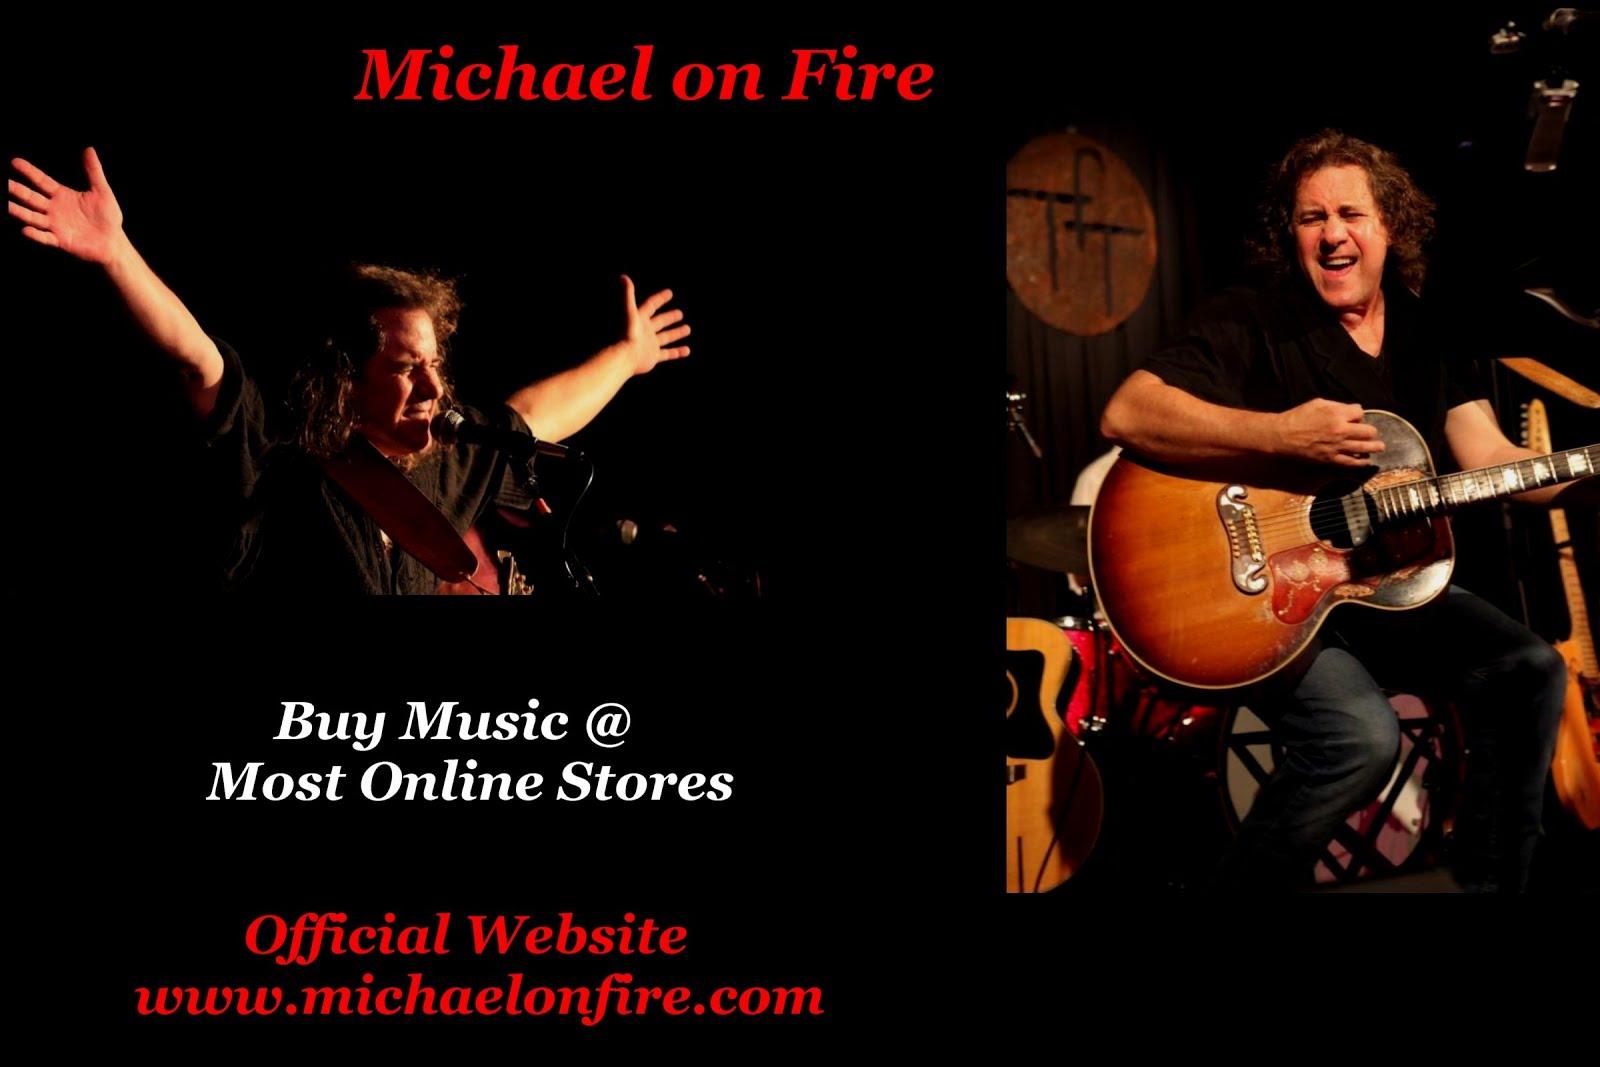 Michael on Fire